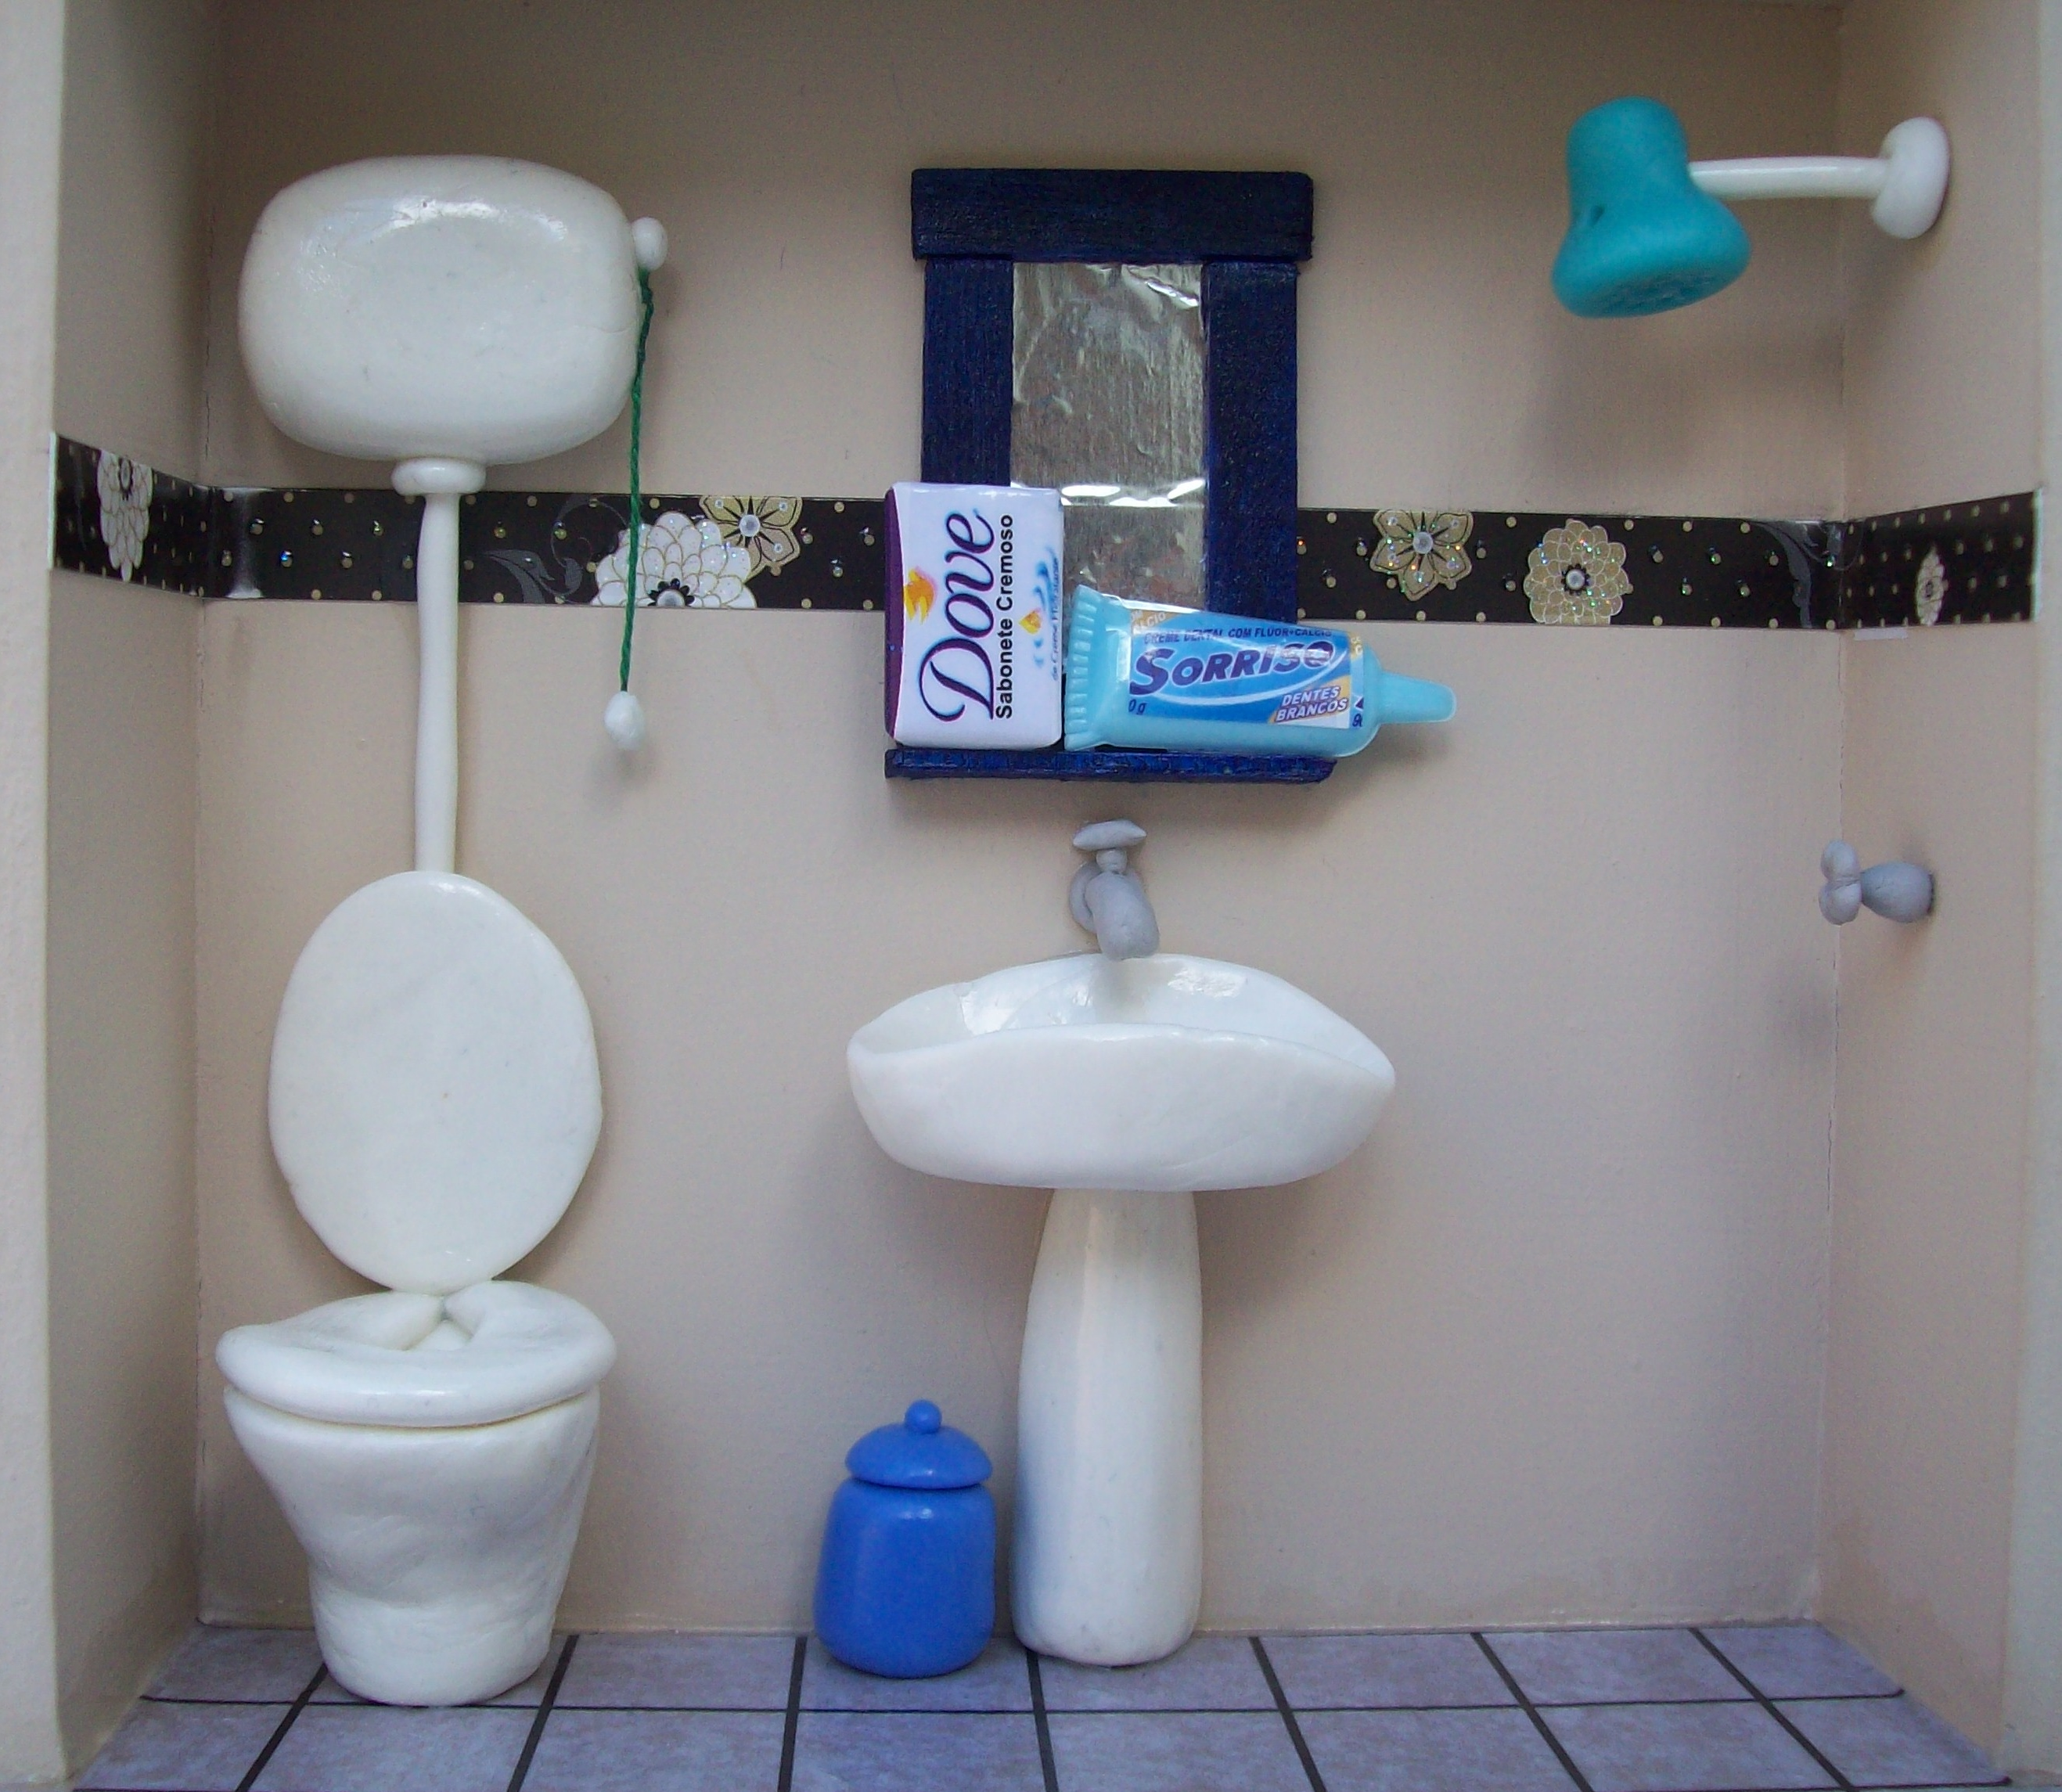 Decoração Banheiro Loja  gotoworldfrcom decoração de banheiro simples de pobre -> Decoracao Banheiro Loja